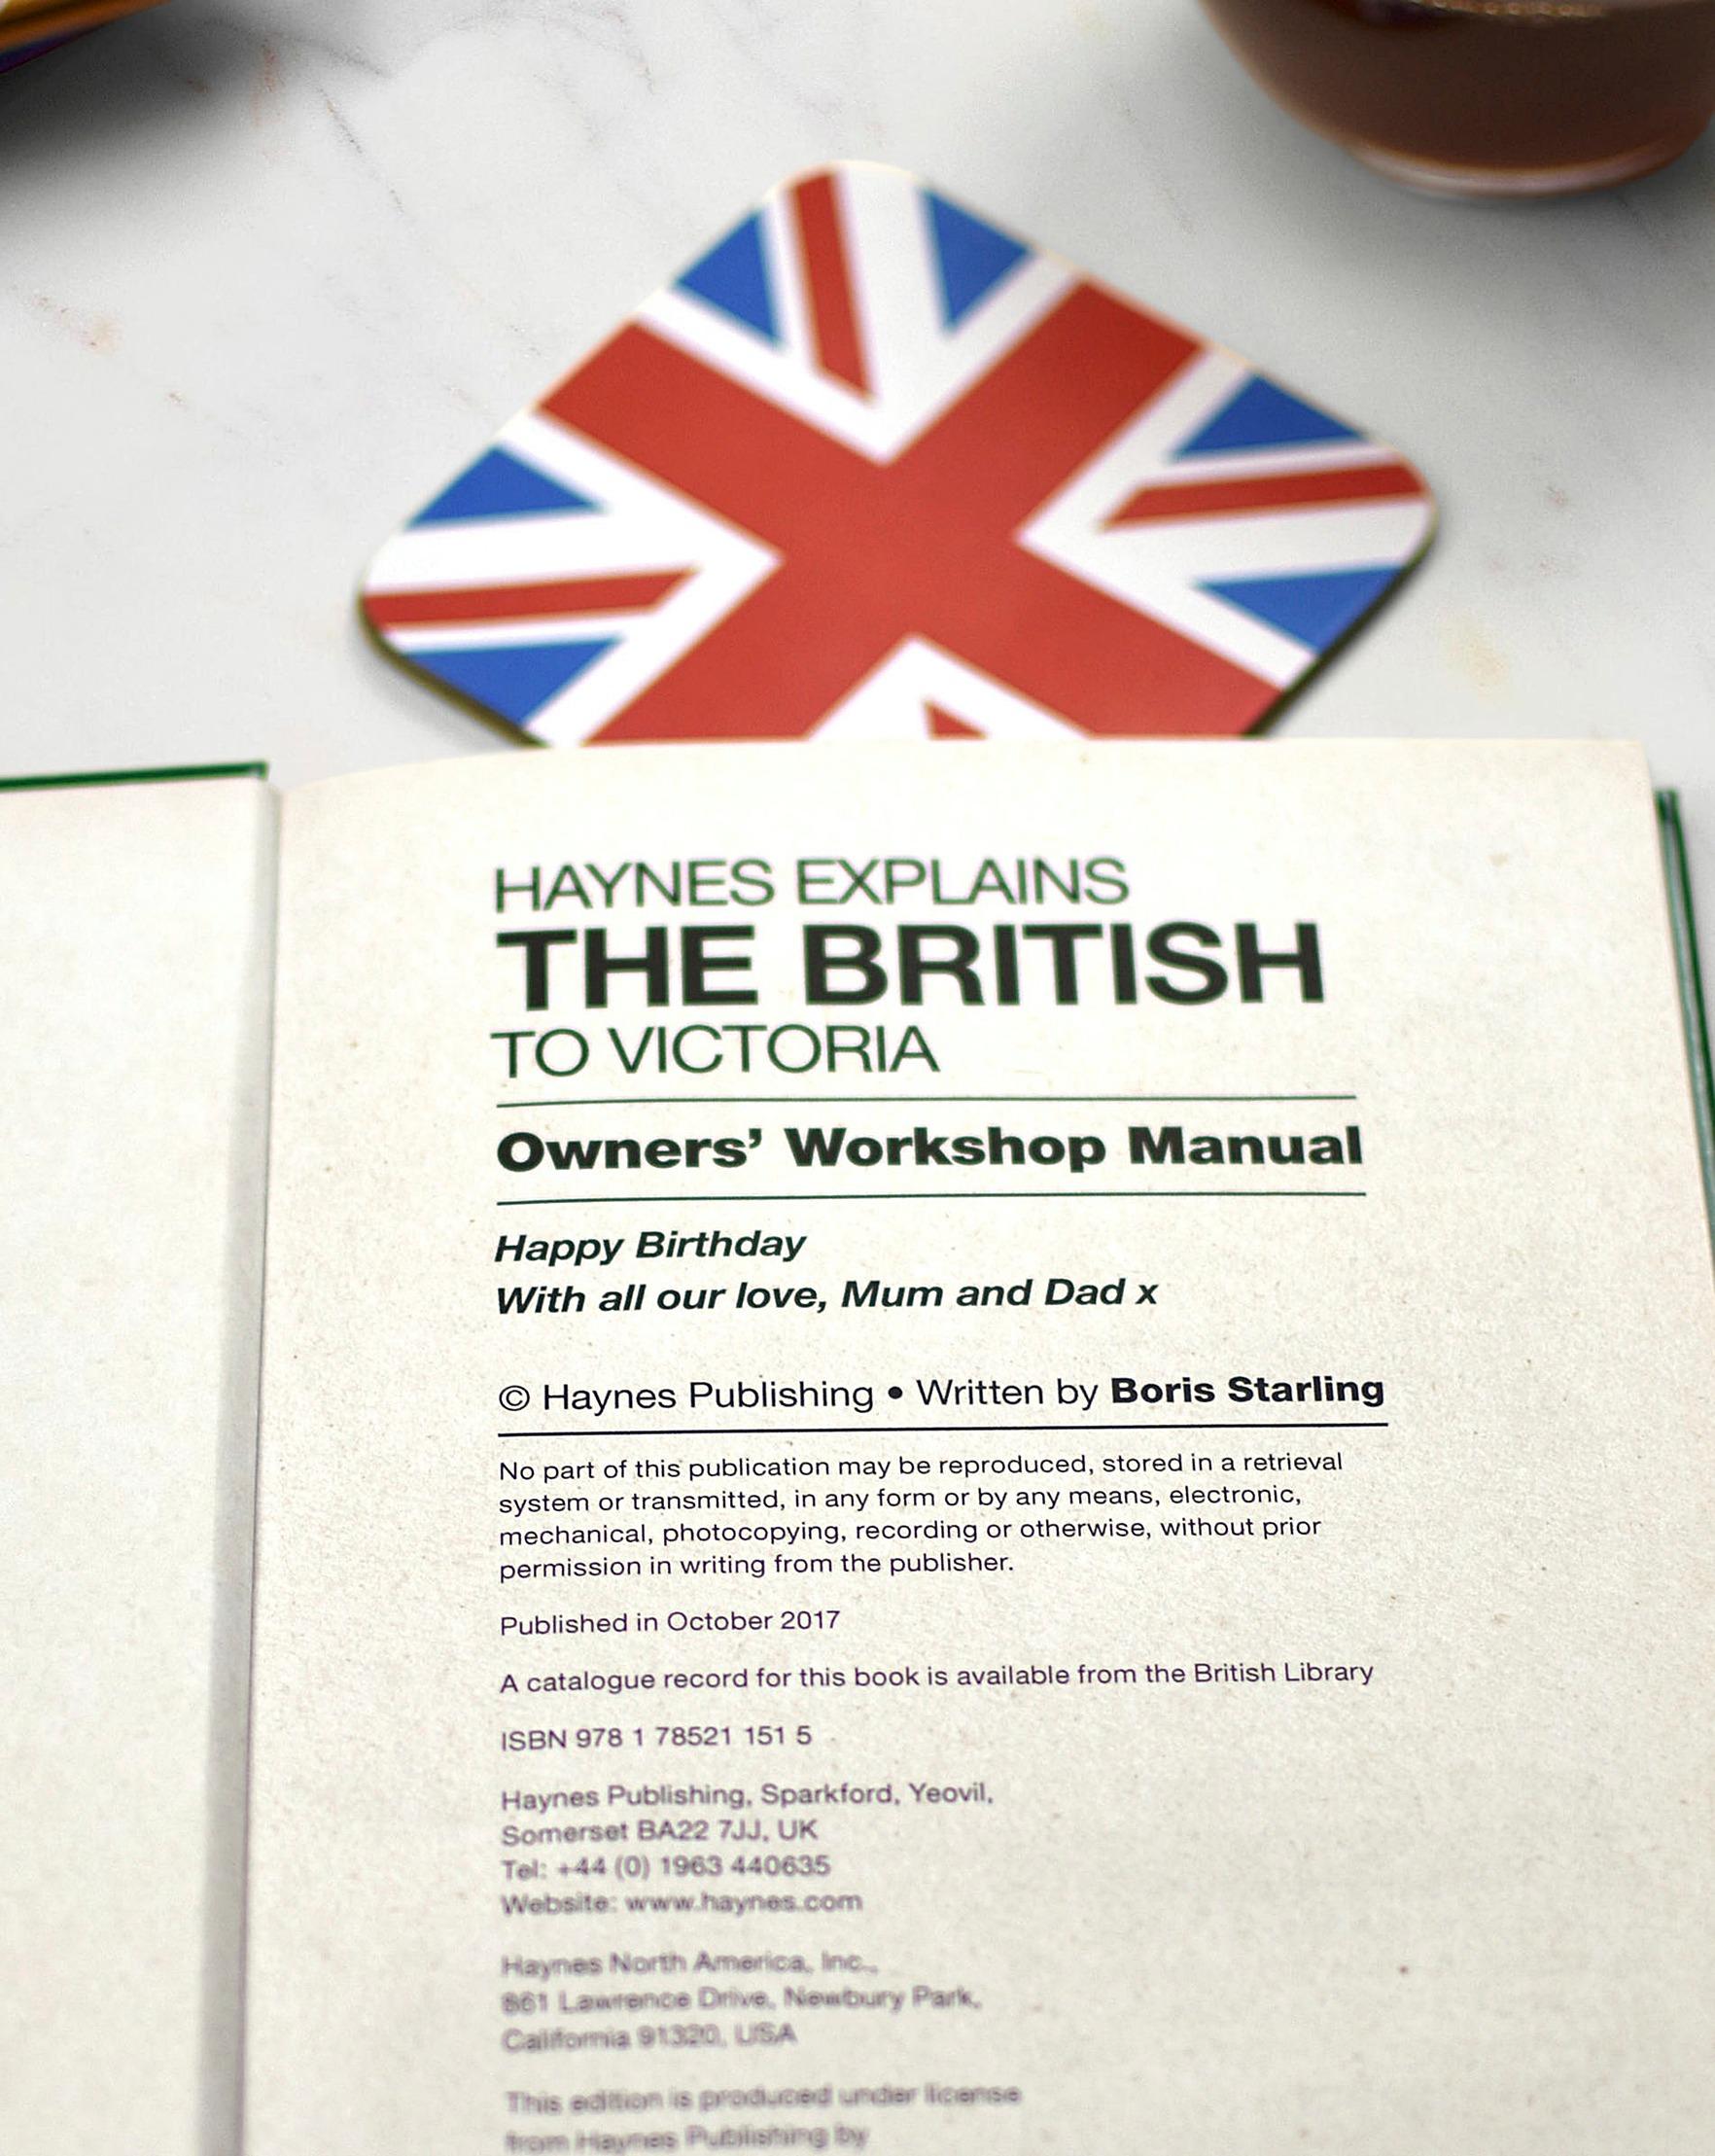 haynes book publisher